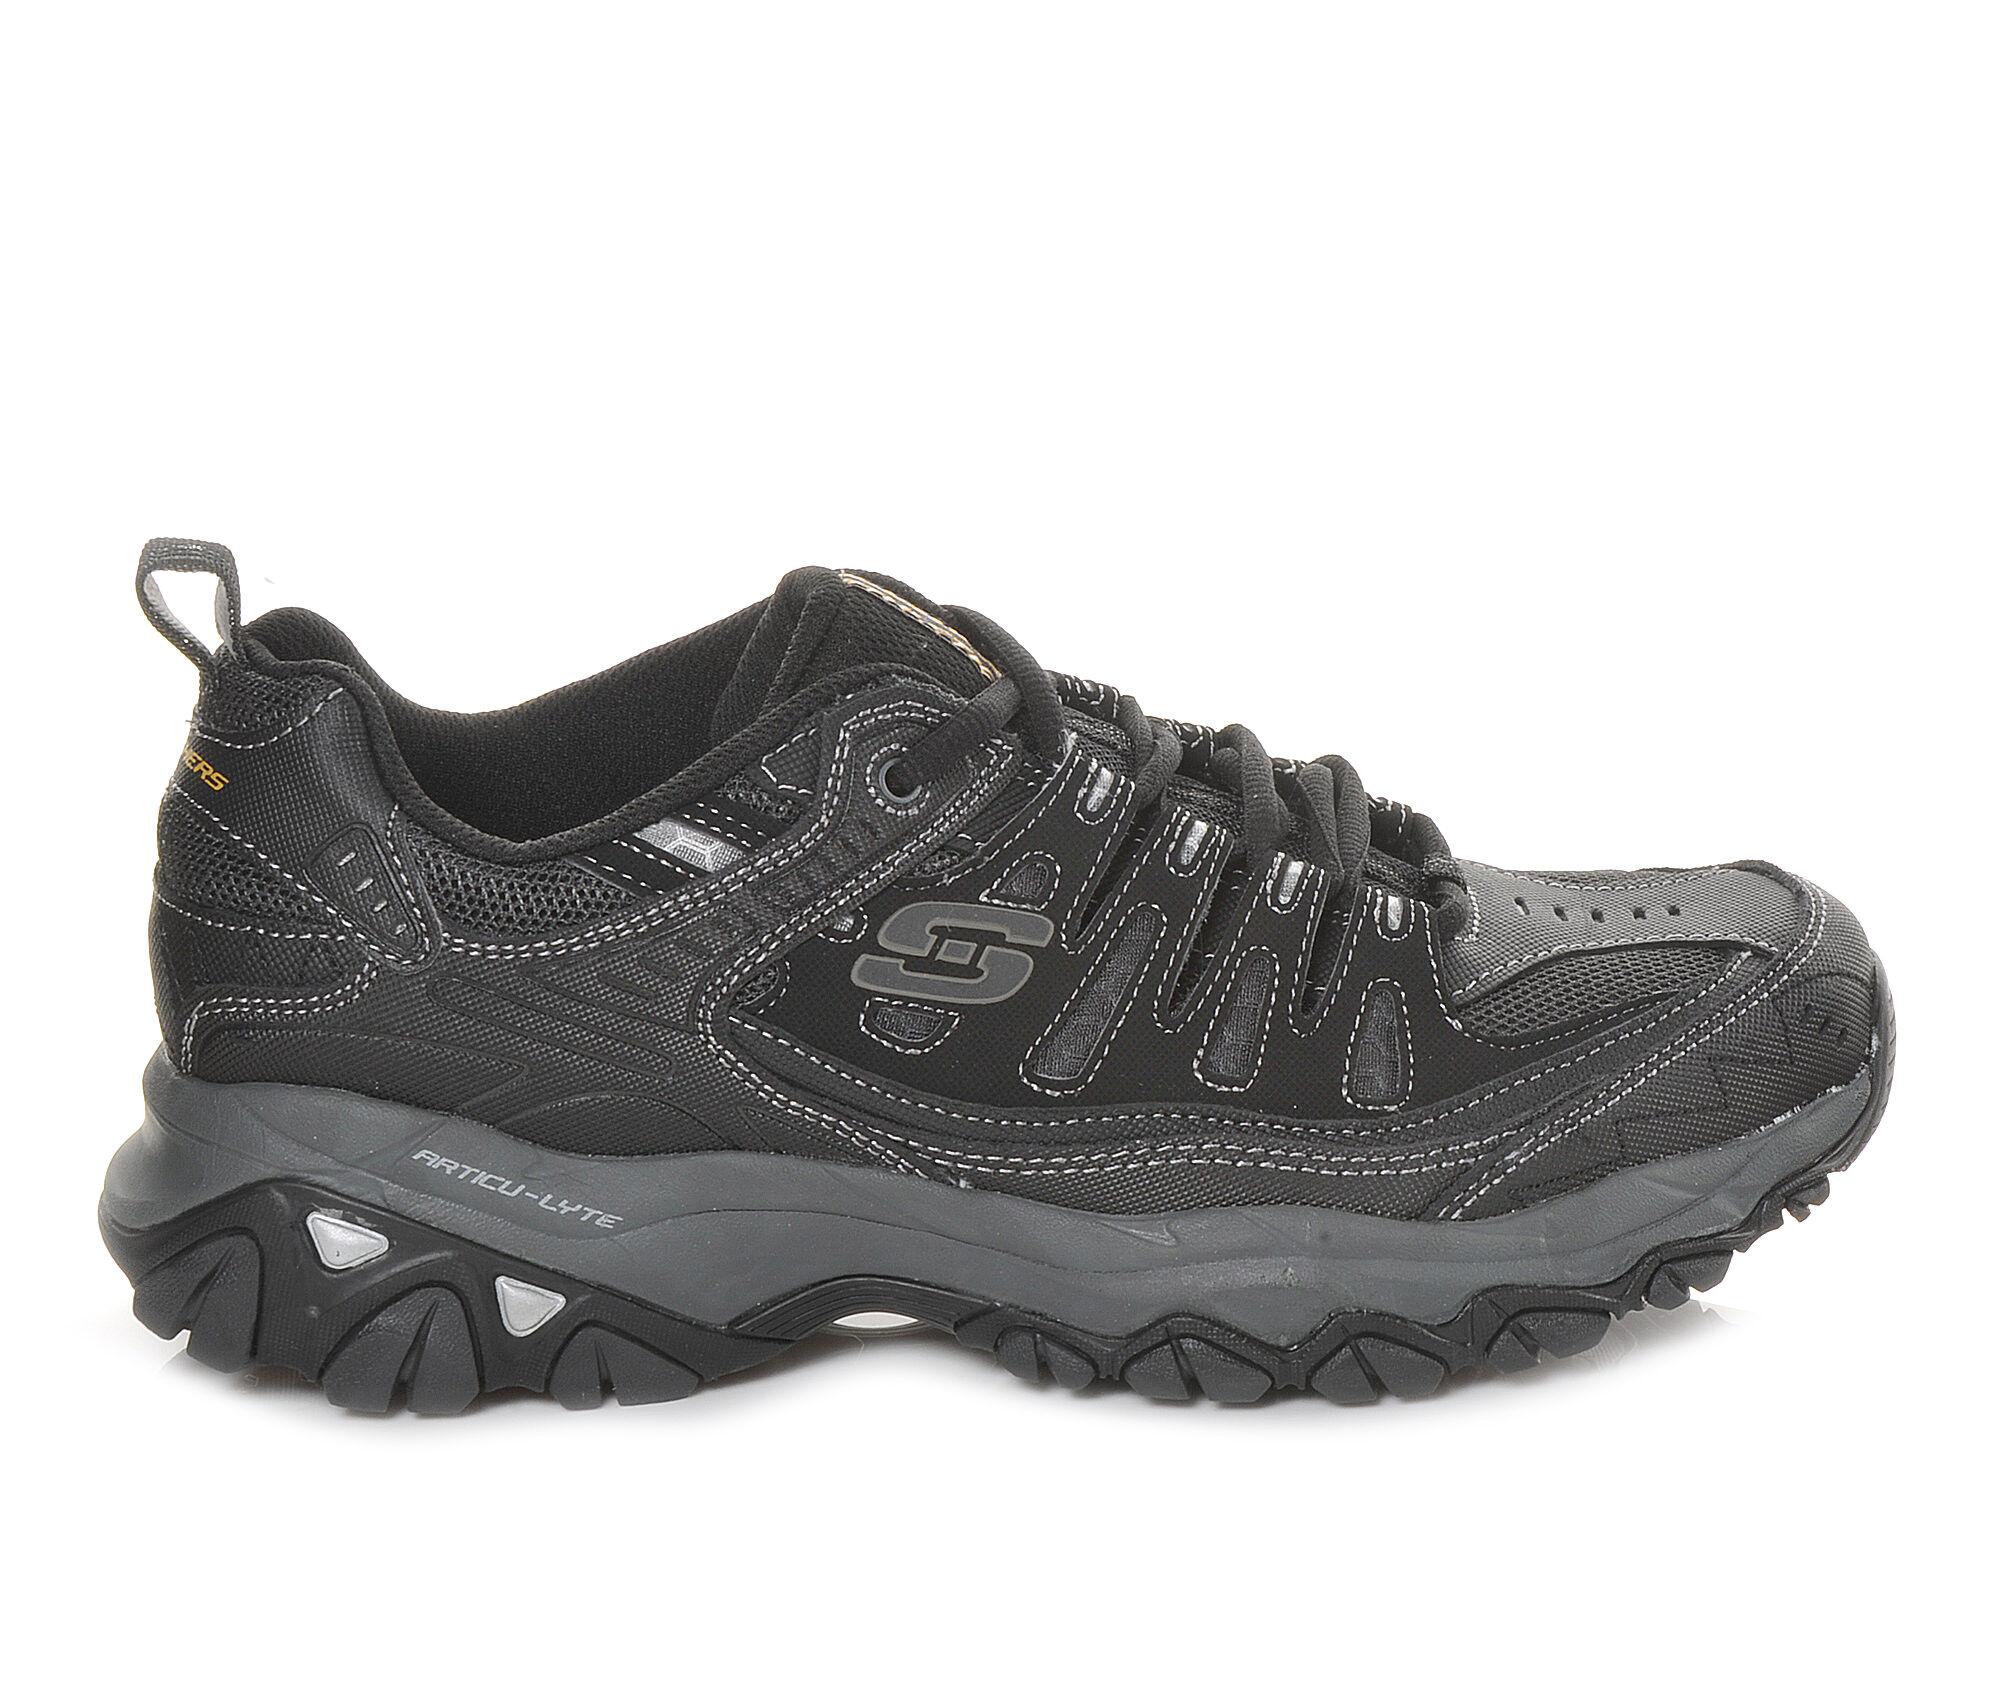 Nike Air Affect VI Herren Training Schuhe WeißSchwarz